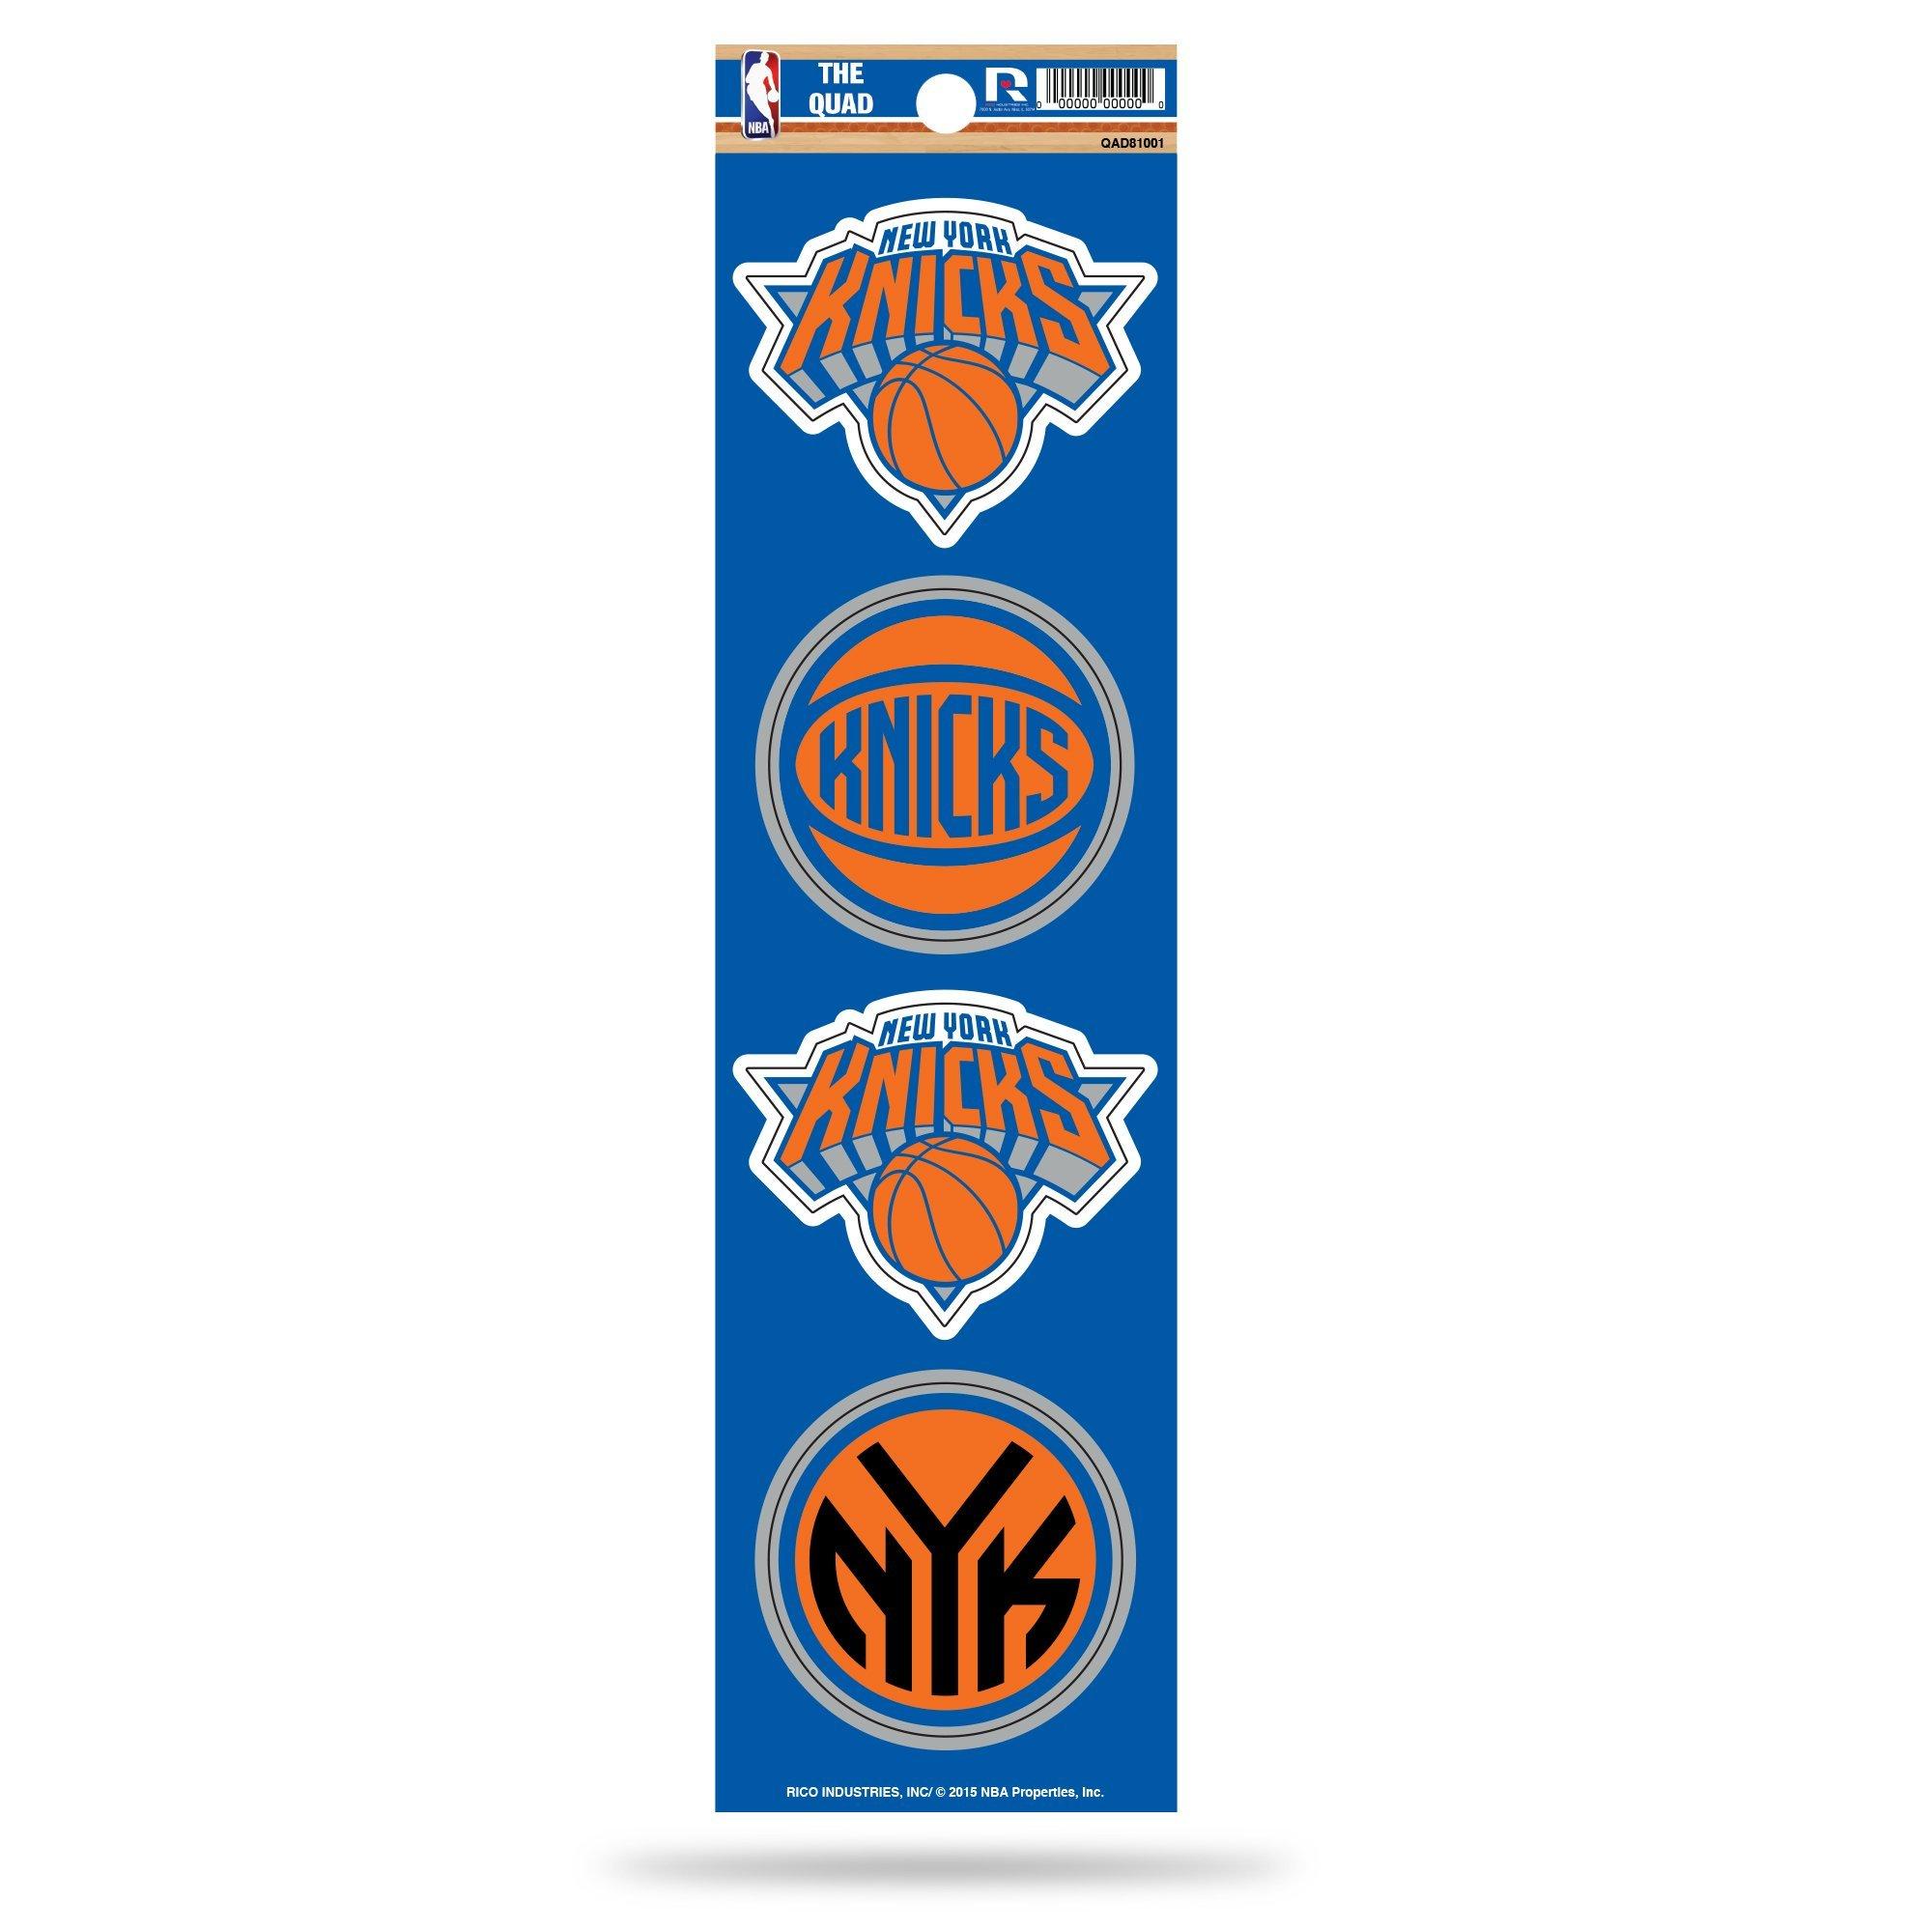 Rico NBA New York Knicks Die Cut 4-Piece The Quad Sticker Sheet